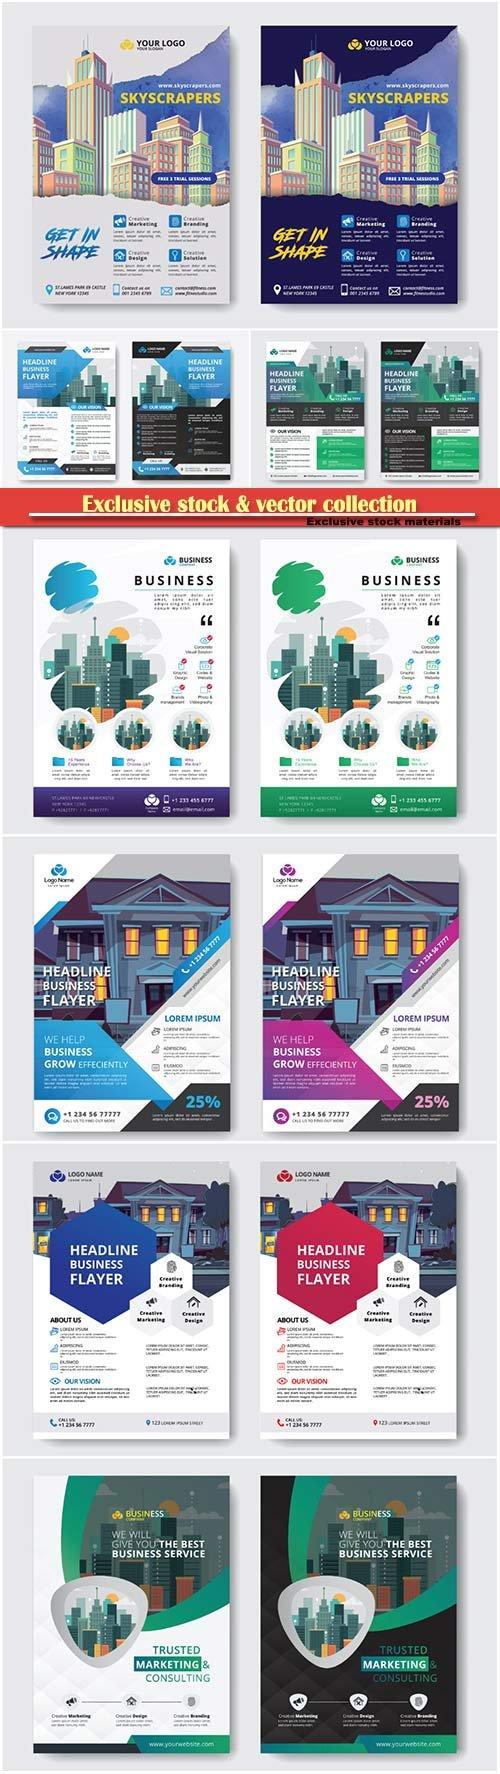 Brochure cover design vector template # 9